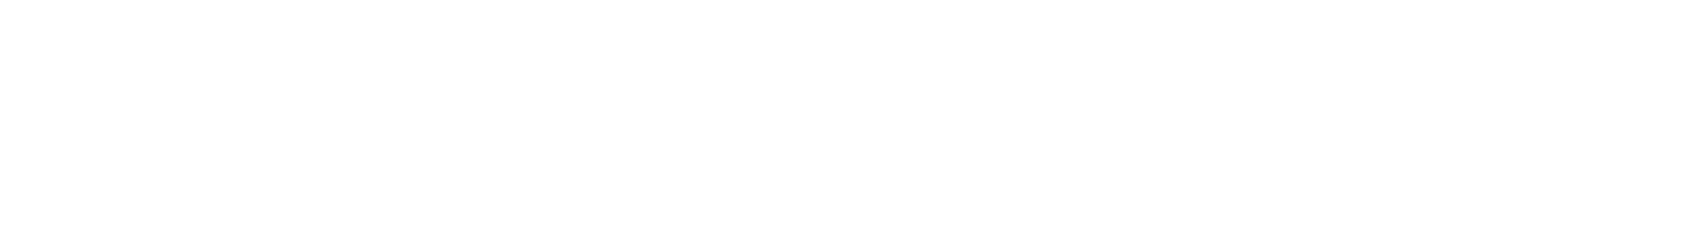 Multi-Water